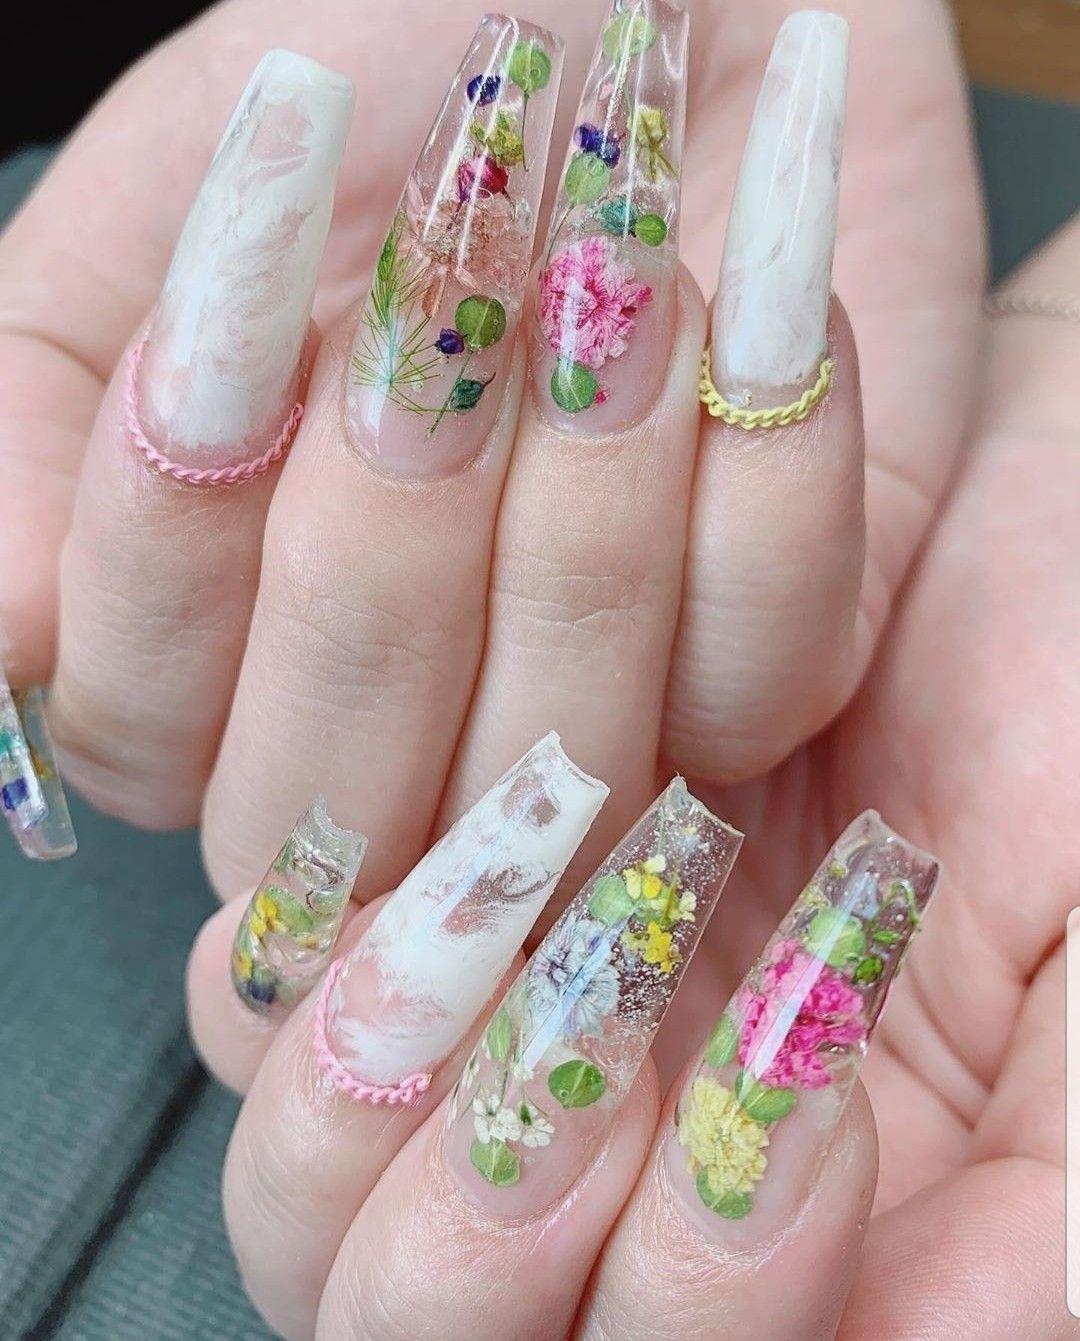 Classy nails, flower nails, elegant nails, girly, dainty